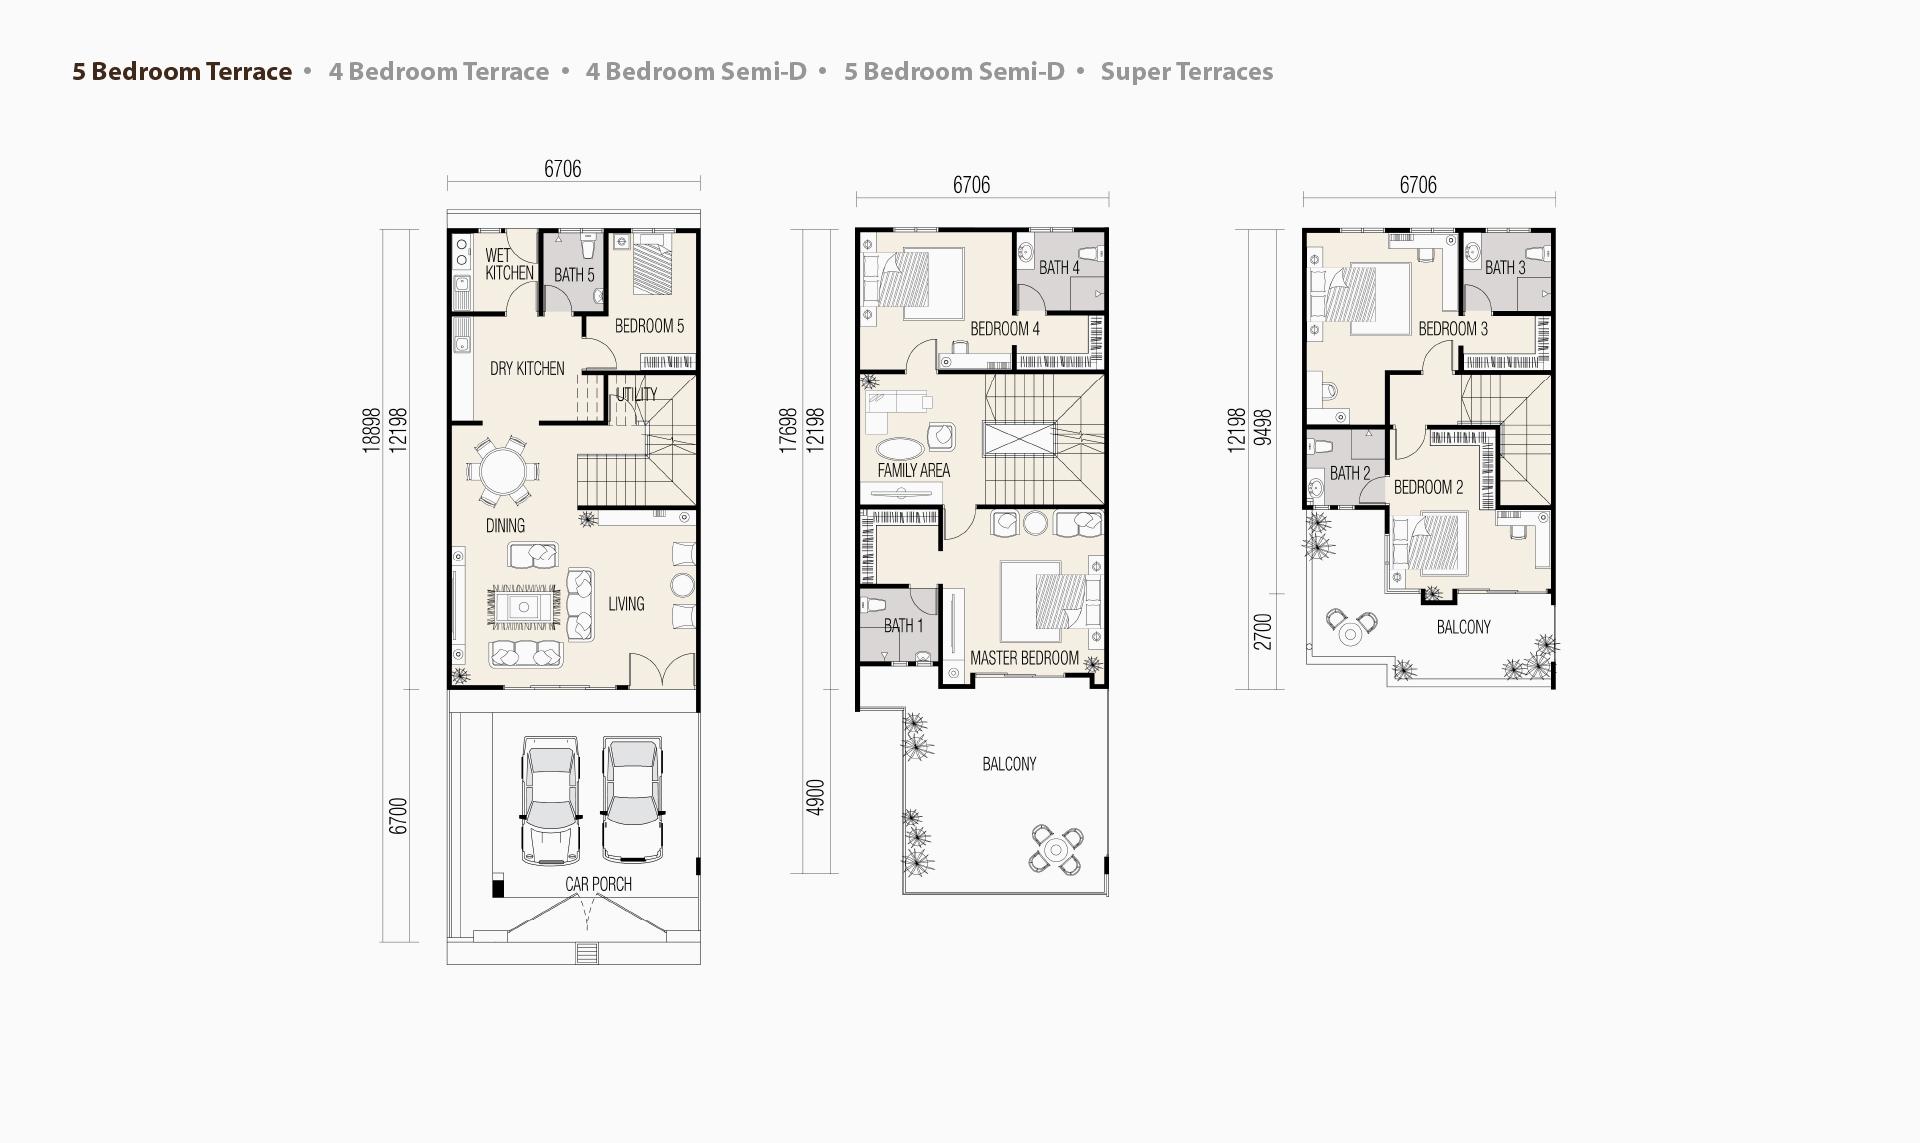 bm_permai_plan_5_bedroom_terrace